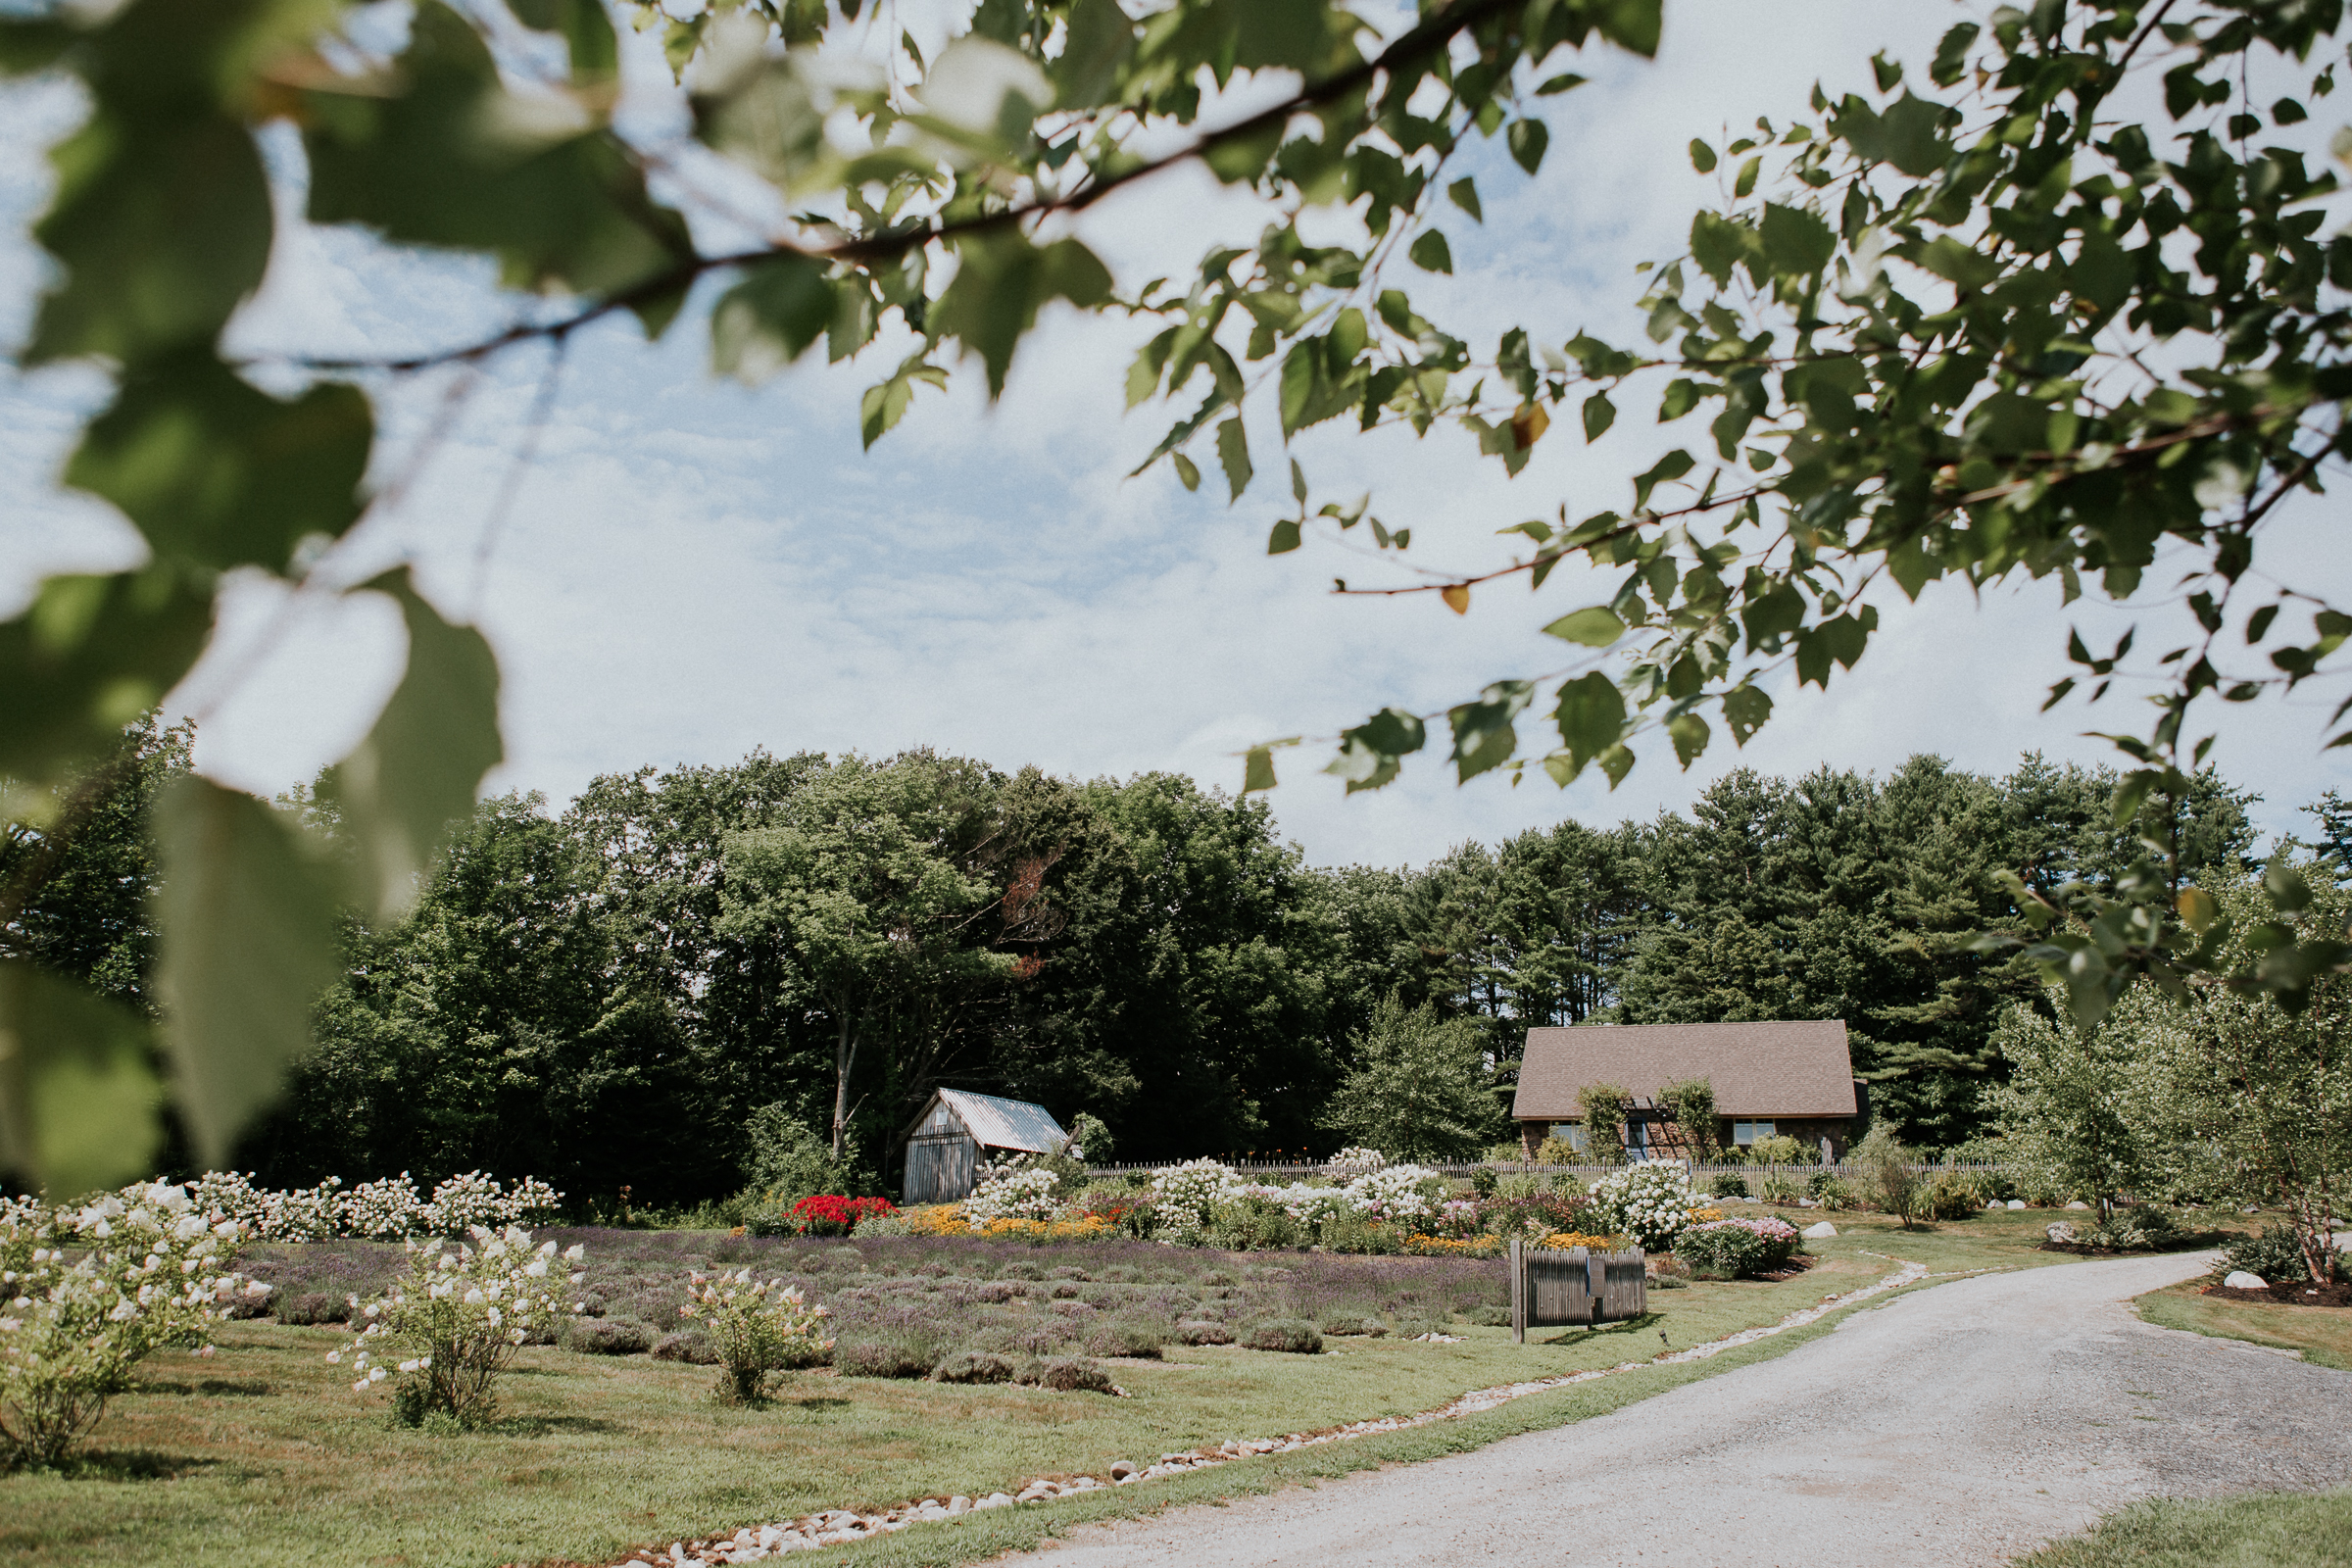 Marianmade-Farm-Wiscasset-Maine-Fine-Art-Documentary-Wedding-Photographer-Elvira-Kalviste-Photography-1.jpg